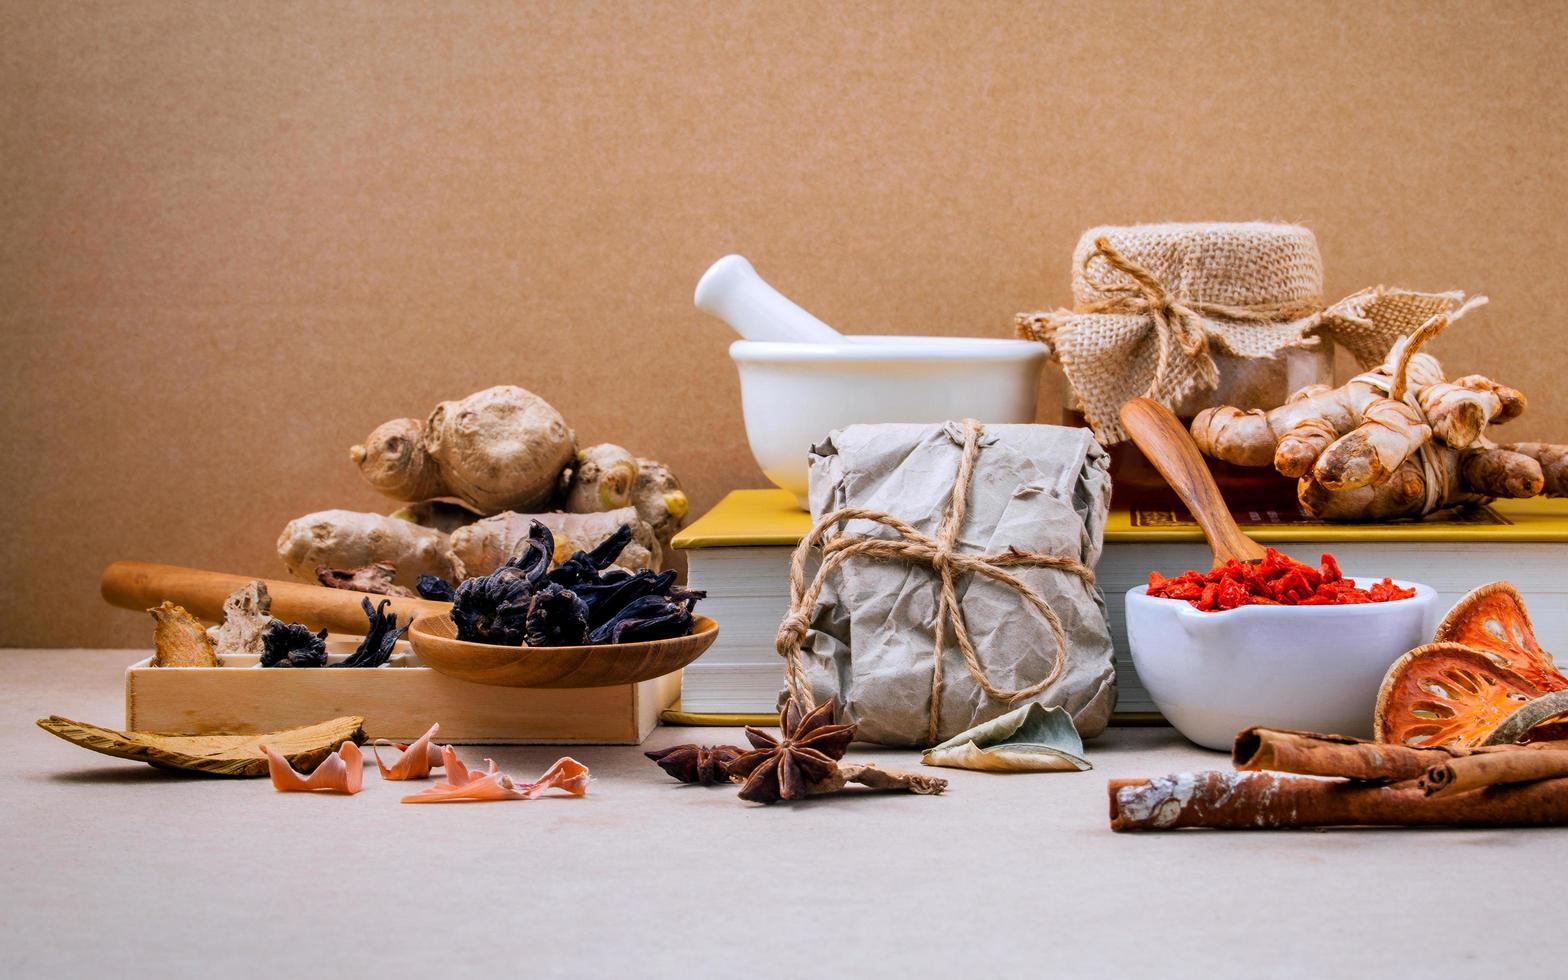 Alternative healthcare with herbs photo